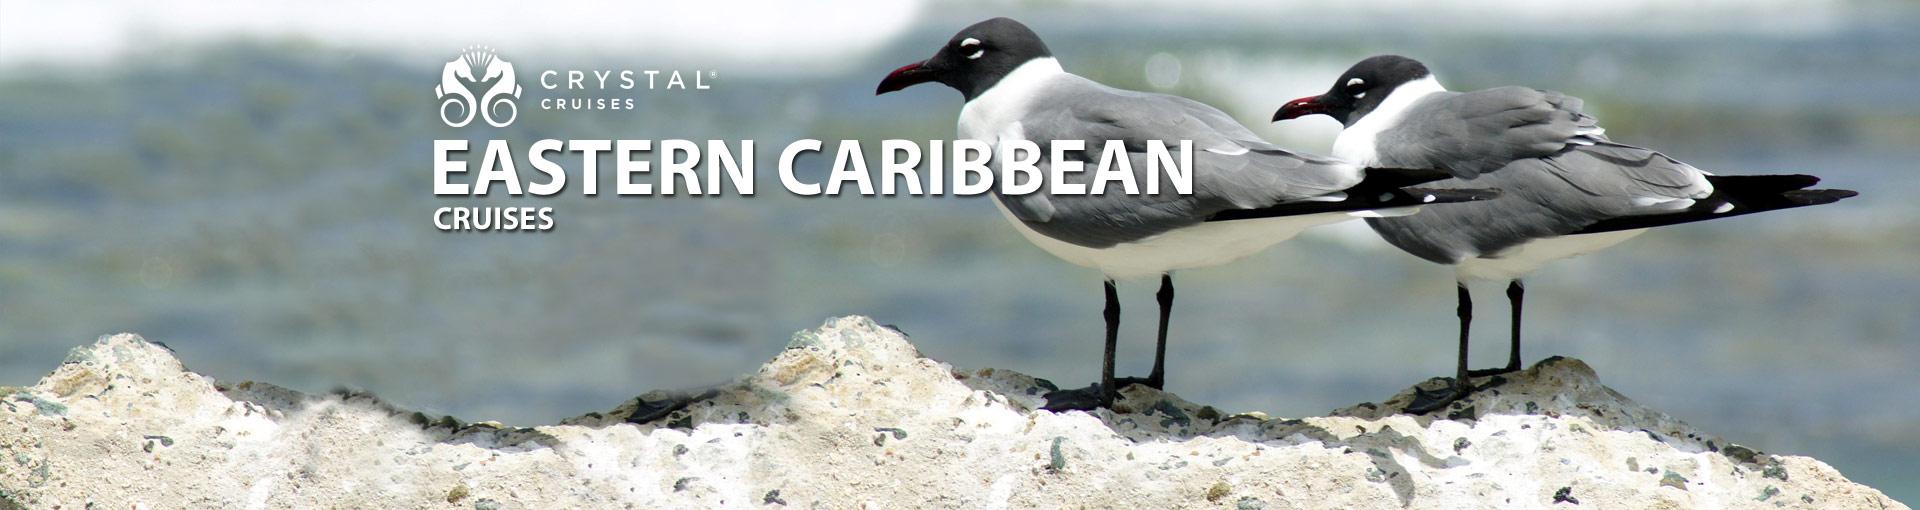 Crystal Cruises Eastern Caribbean Cruises